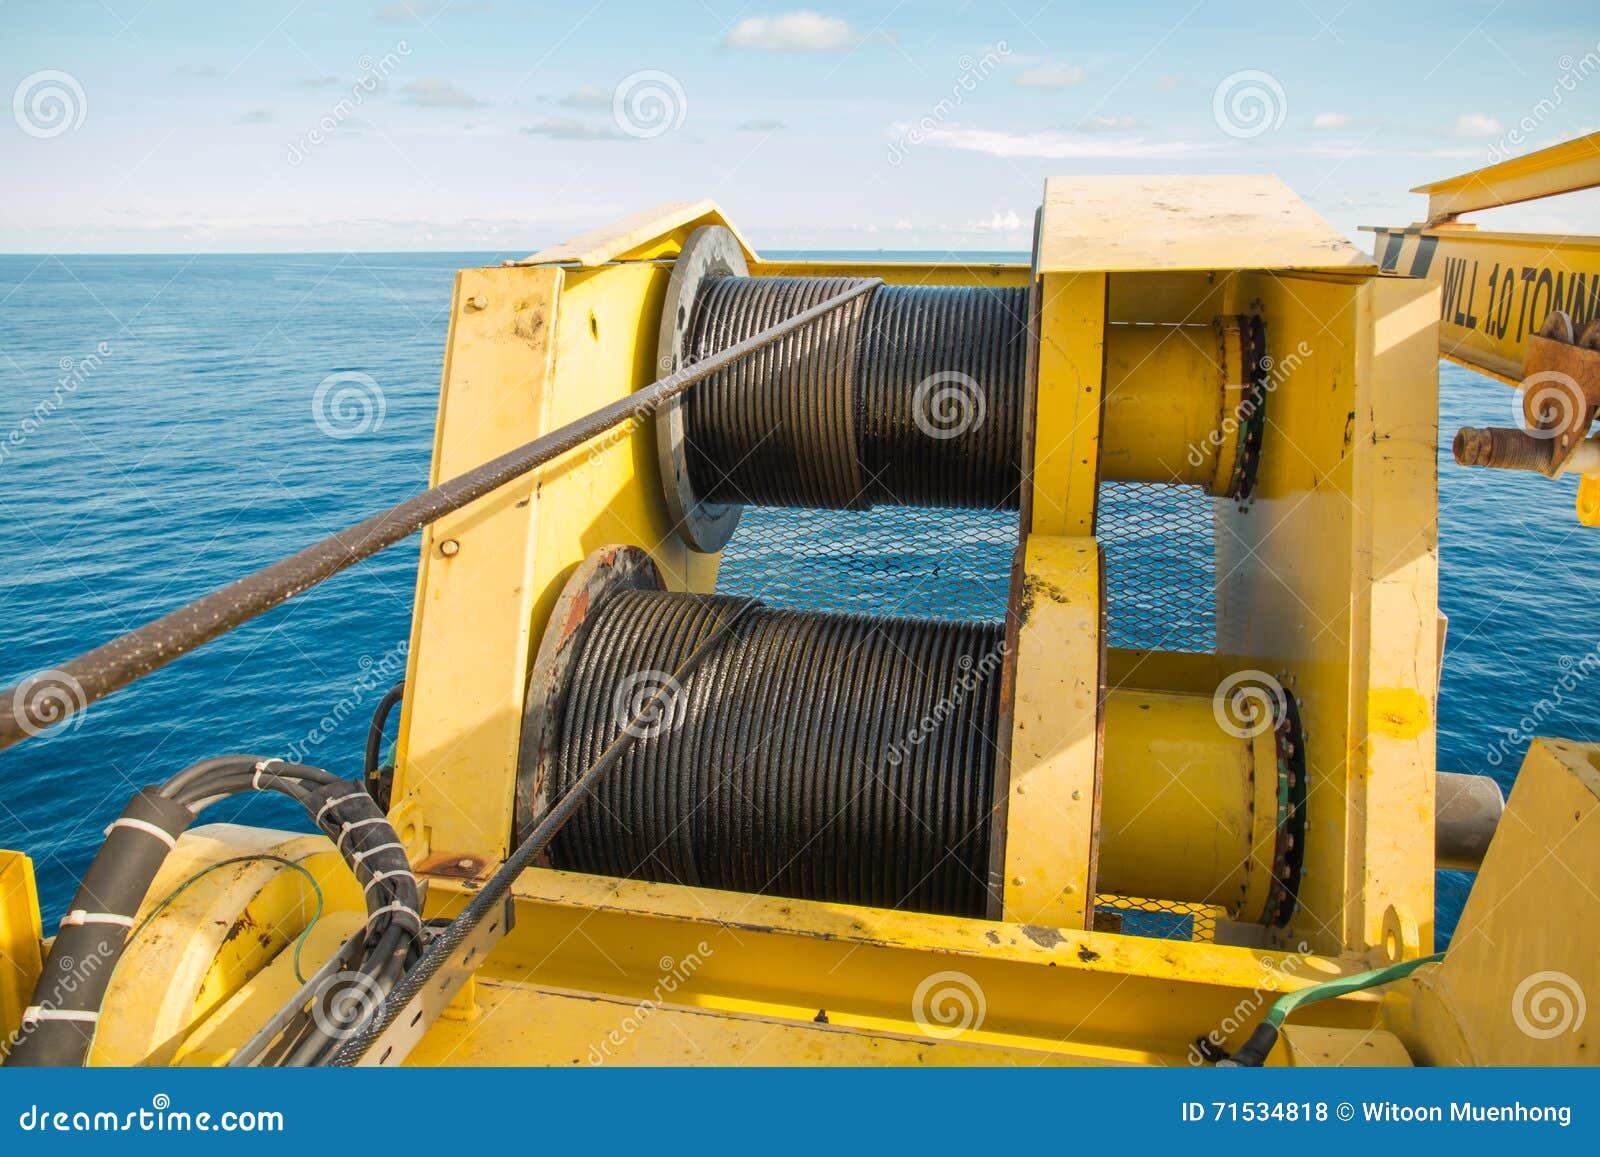 Crane Winch, Steel Wire Rope Drum. Stock Photo - Image of energy ...